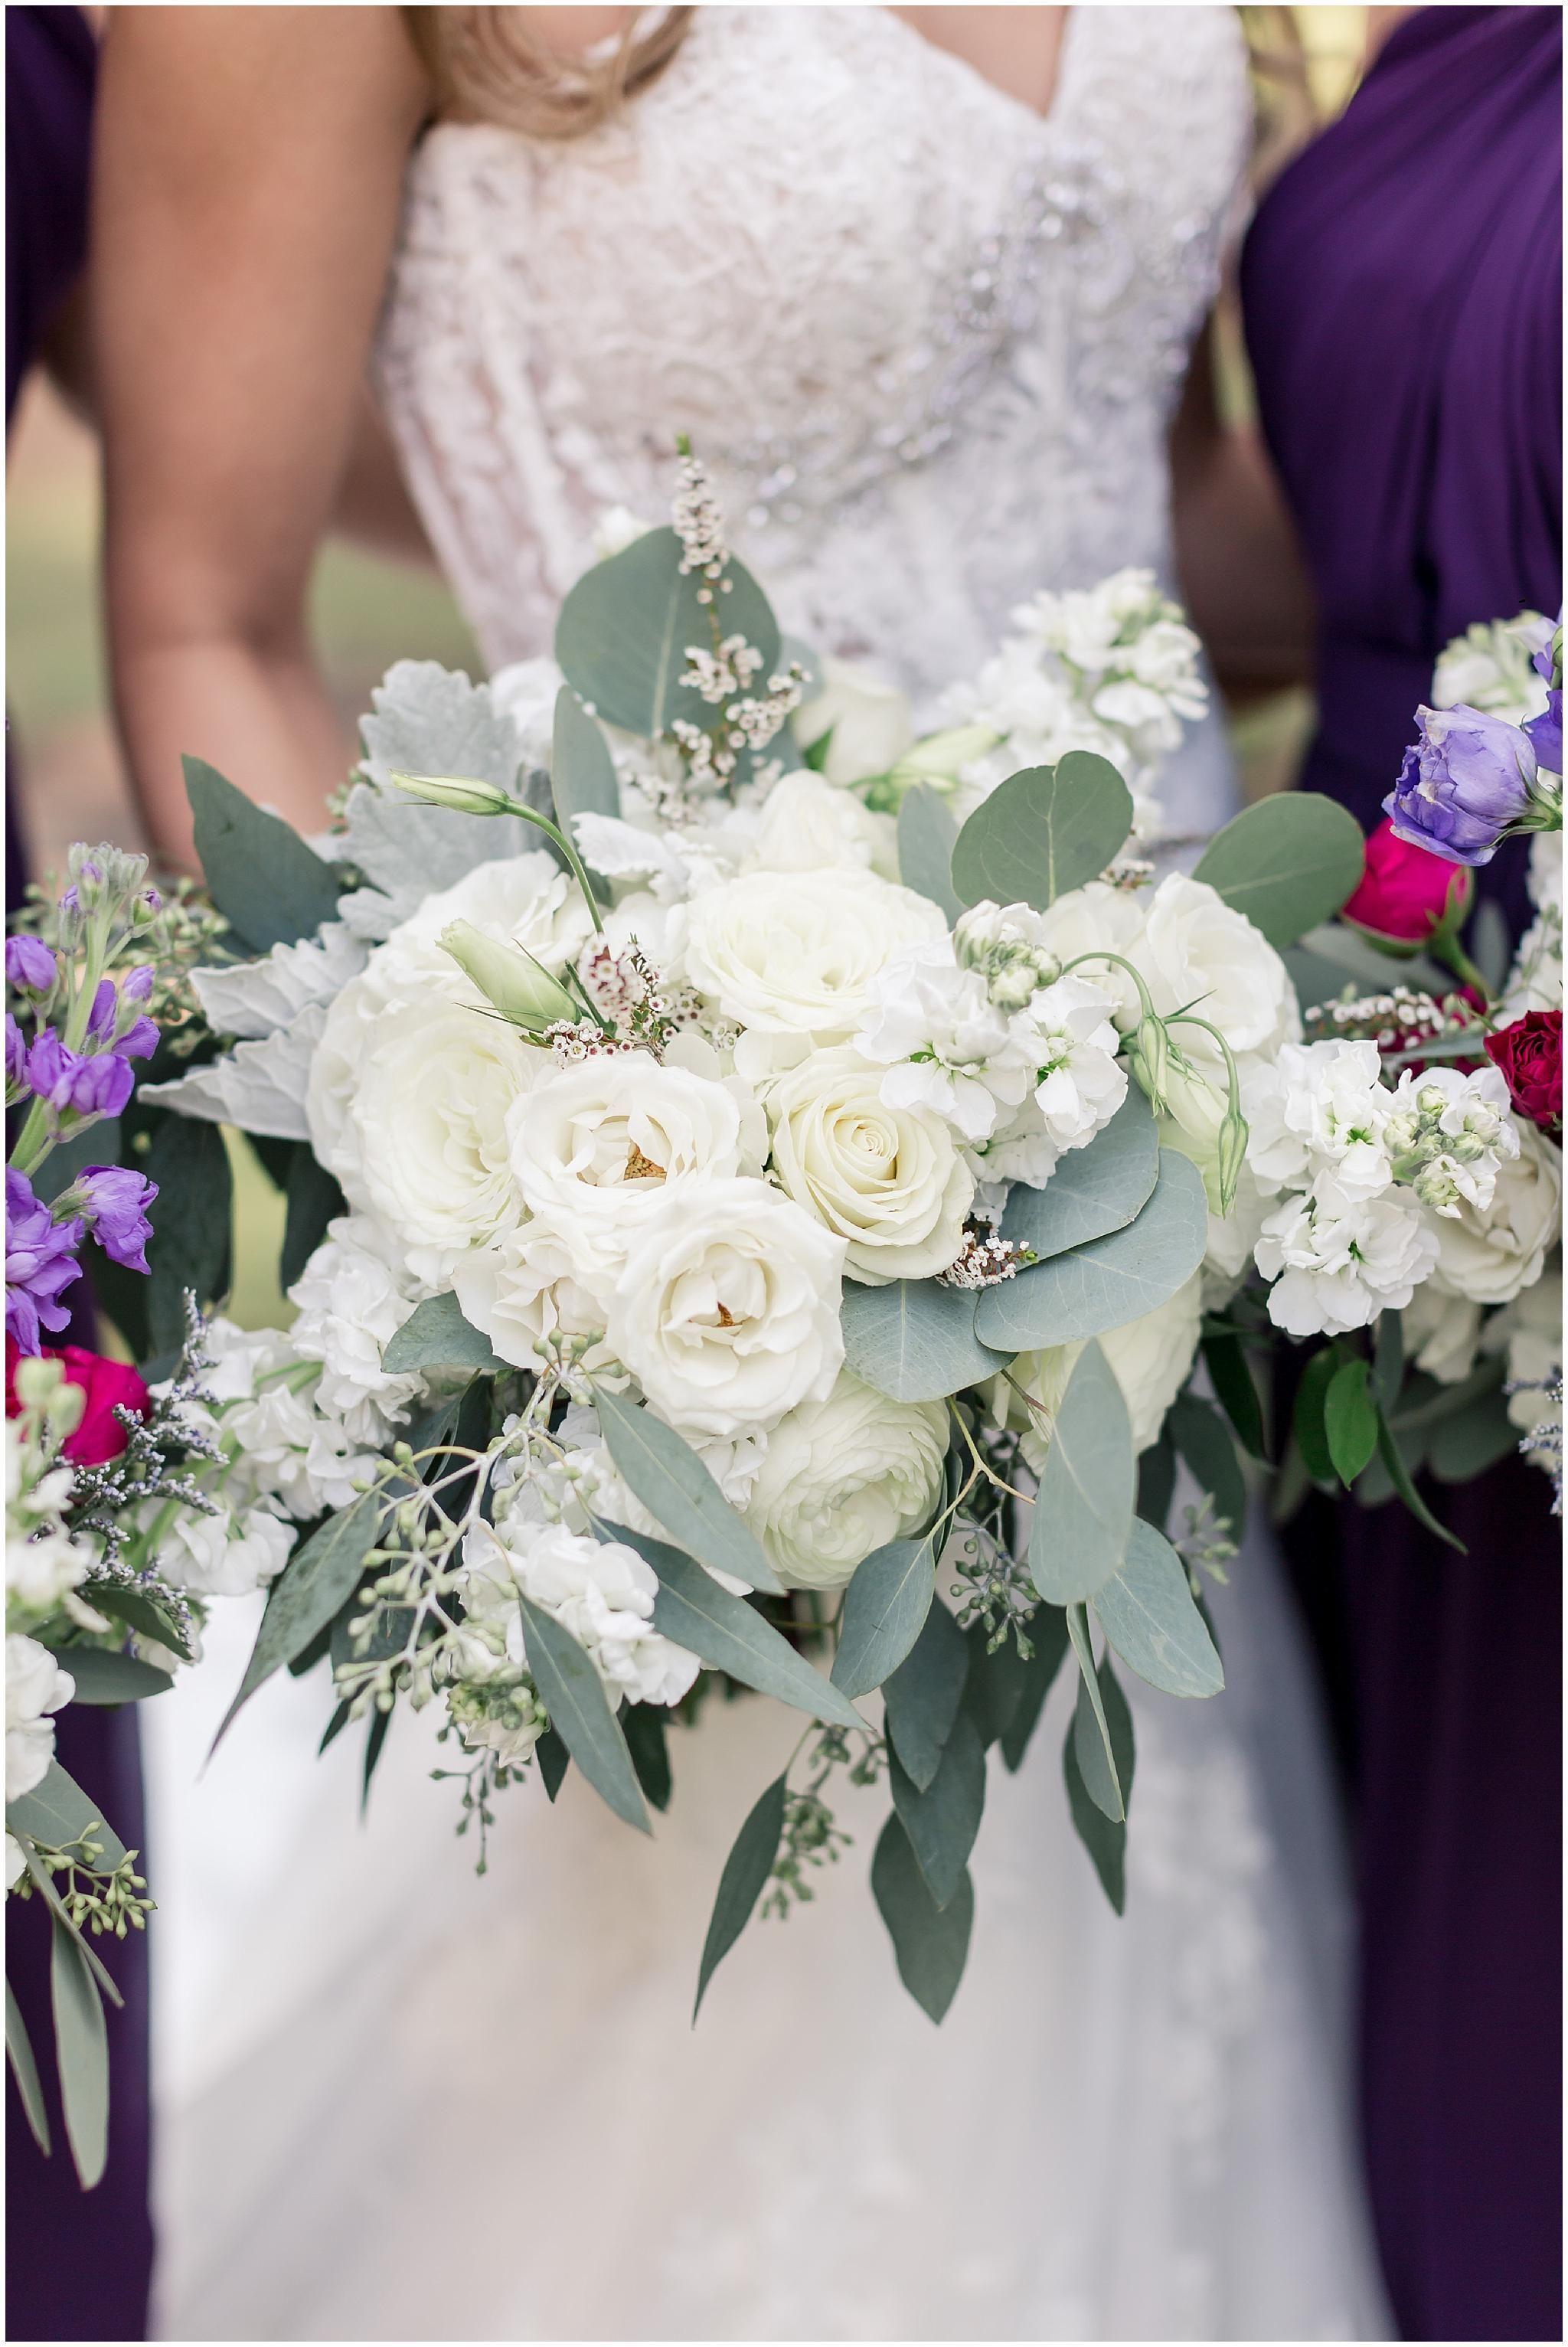 Wedding decorations with flowers november 2018 white wedding bouquet eucalyptus greenery Roses ranunculus baby